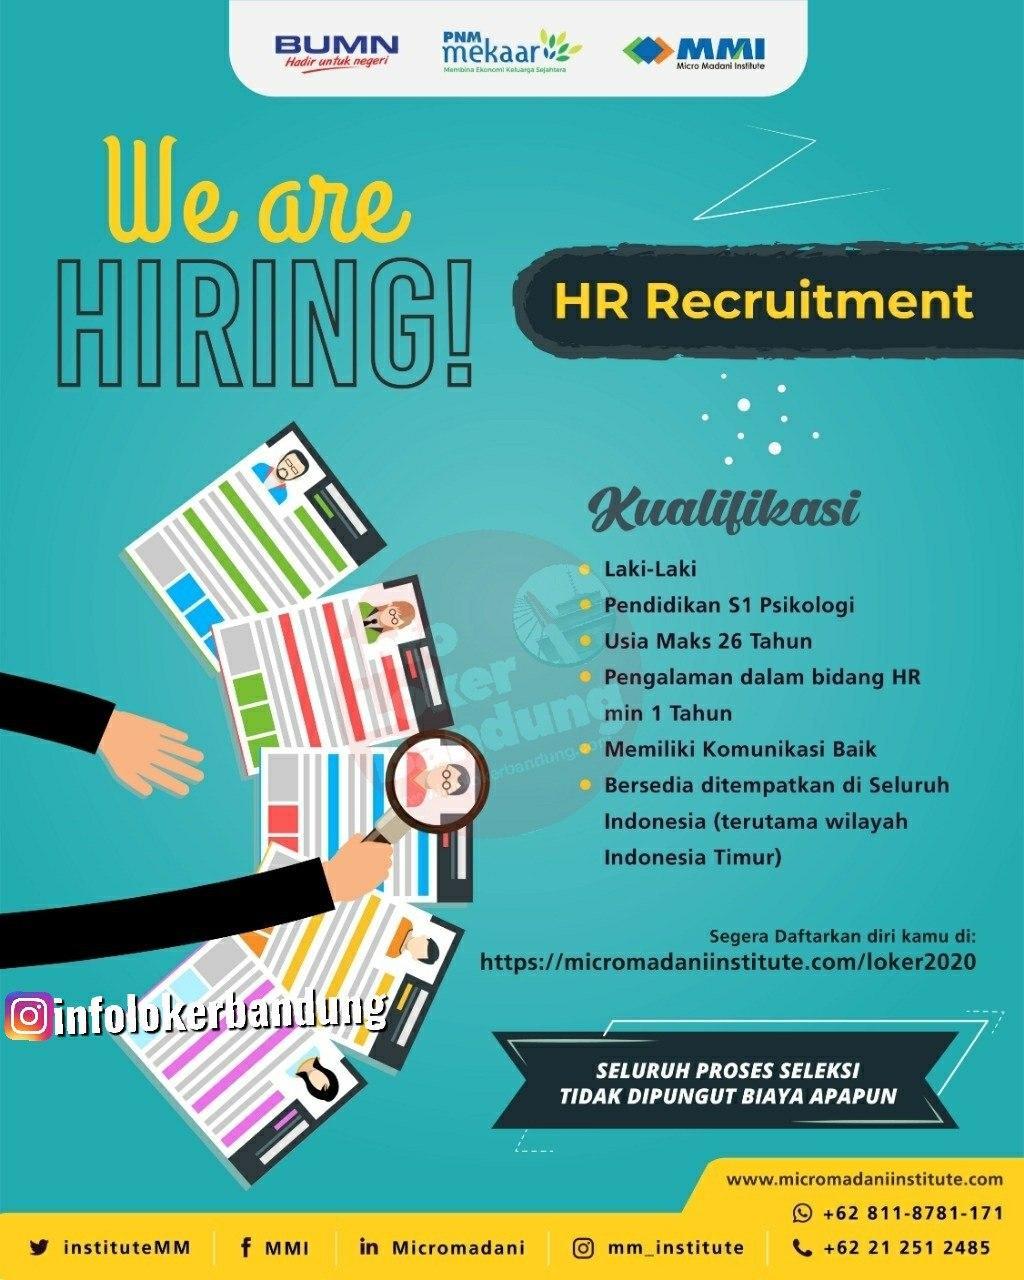 Lowongan Kerja HR Recruitment Micromadani Institute Bandung Maret 2020